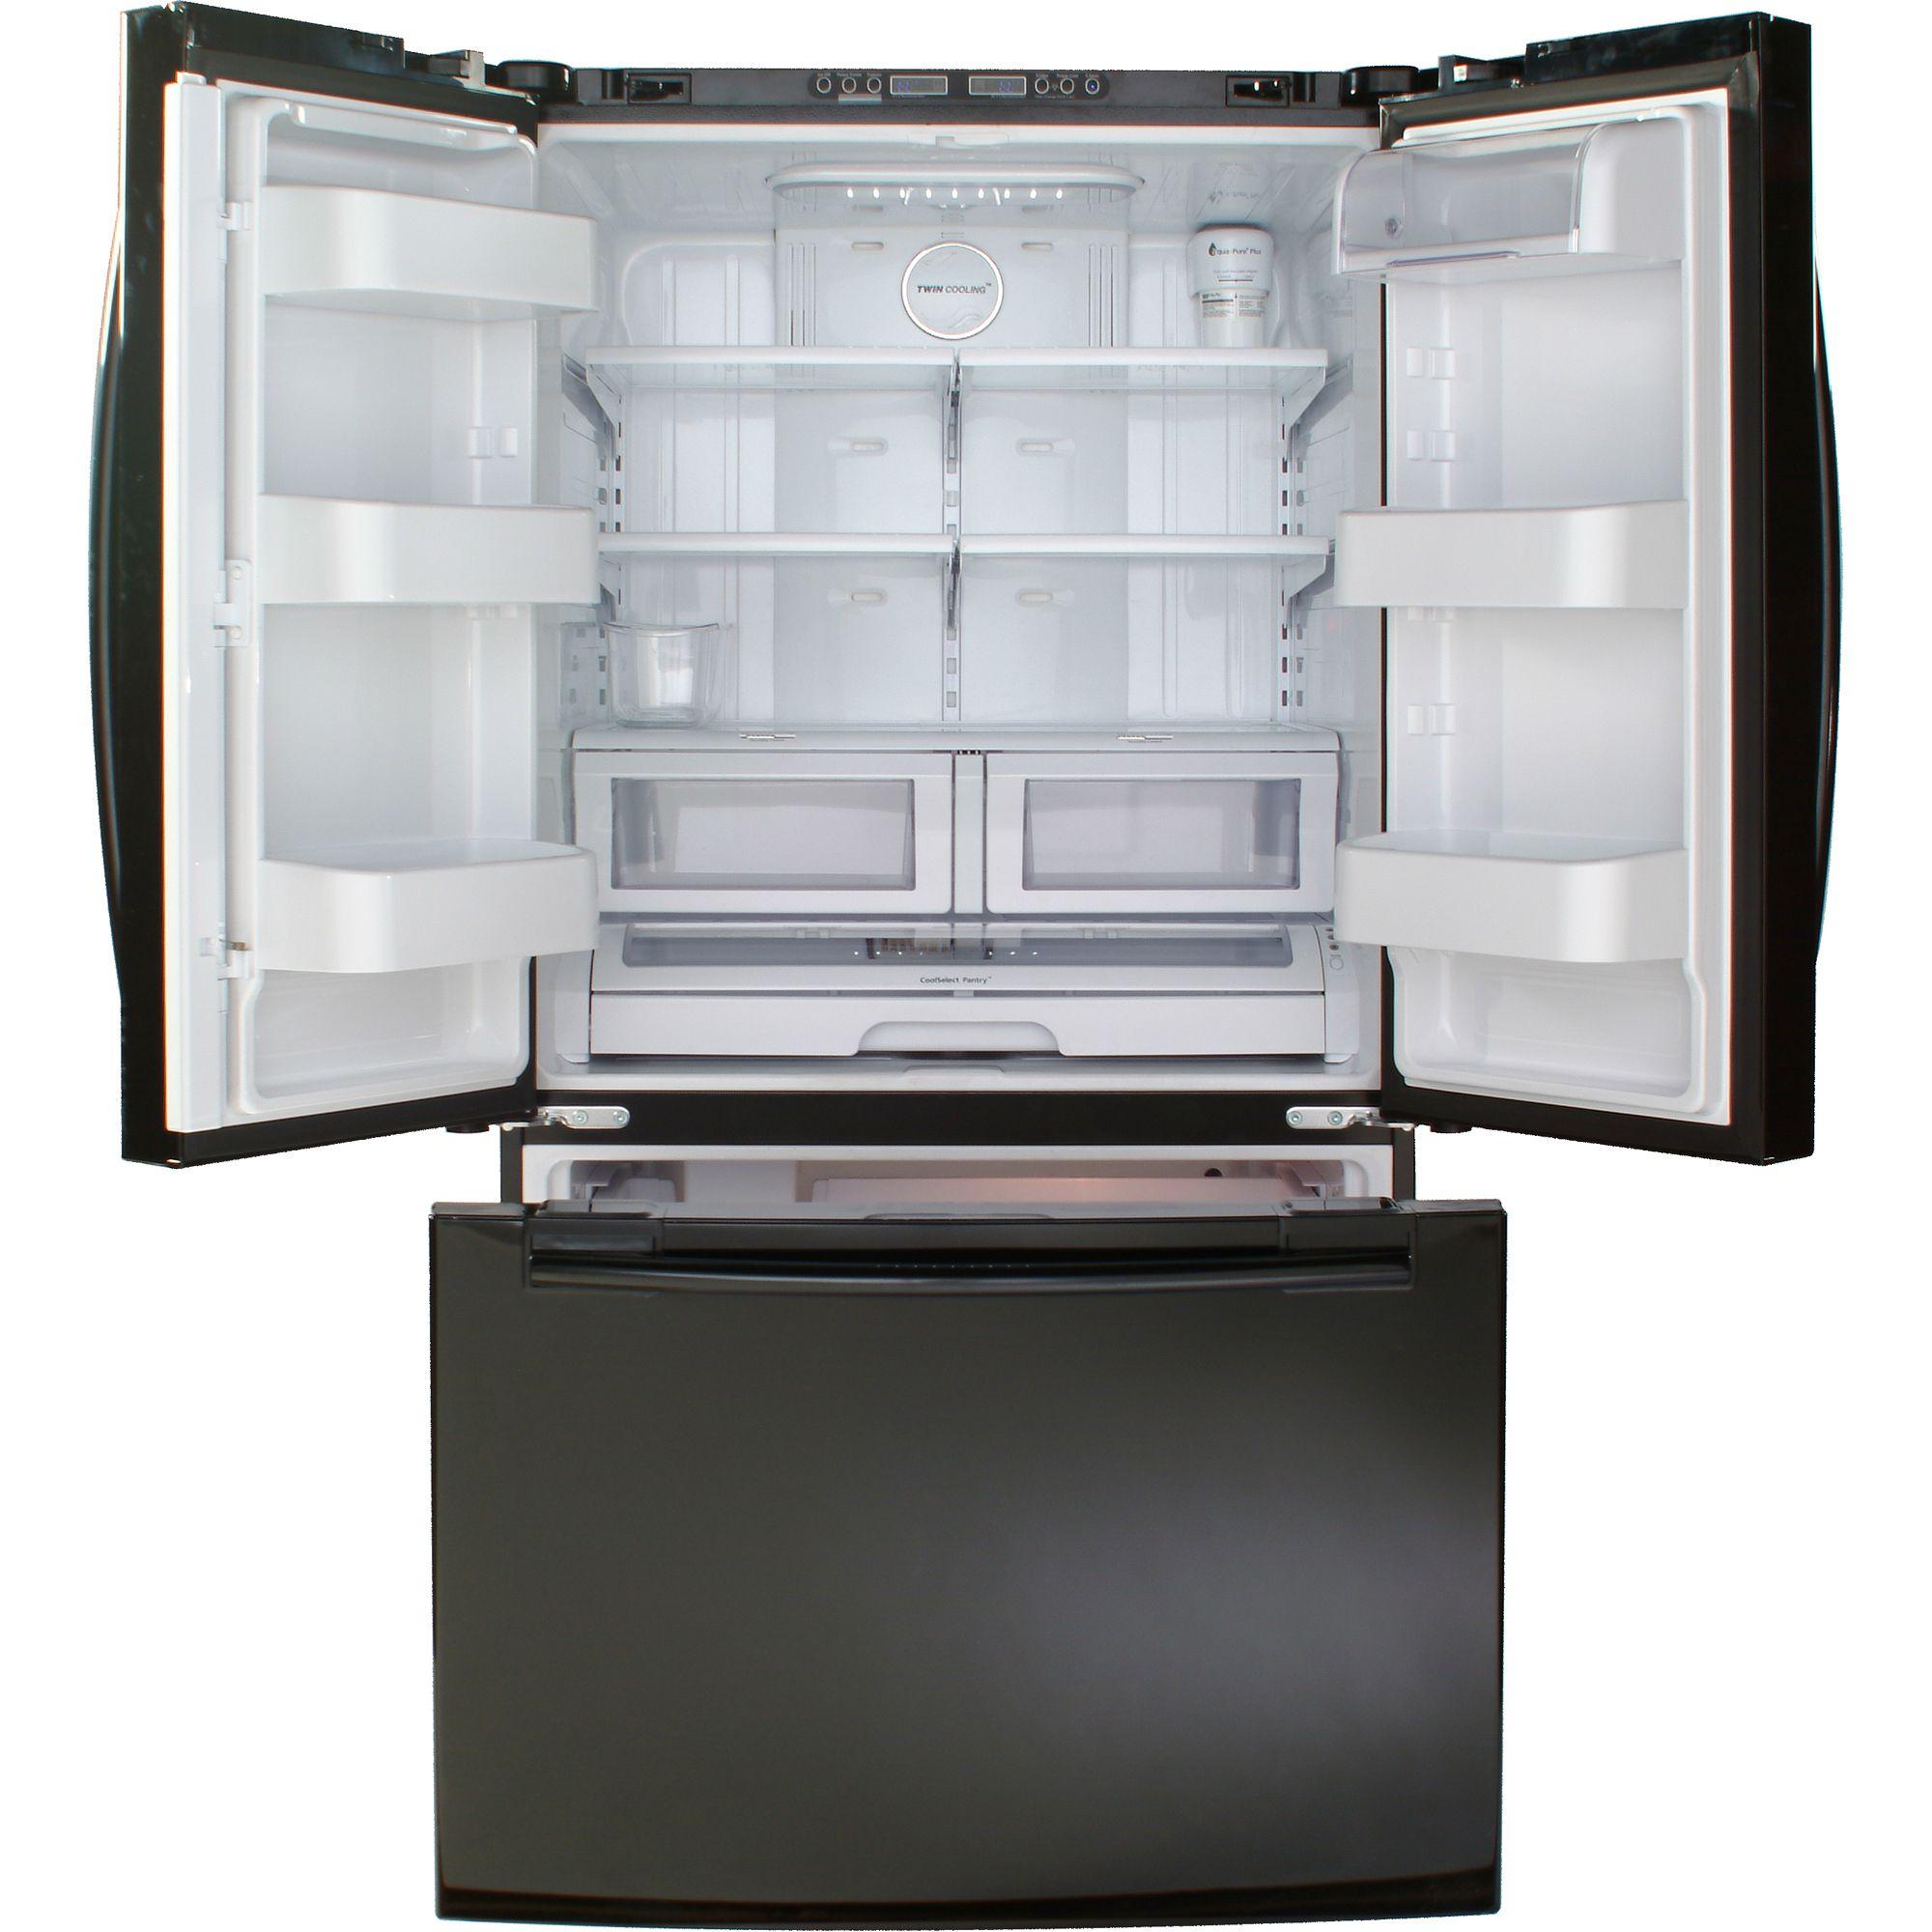 Samsung 26.0 cu. ft. Bottom-Freezer Refrigerator